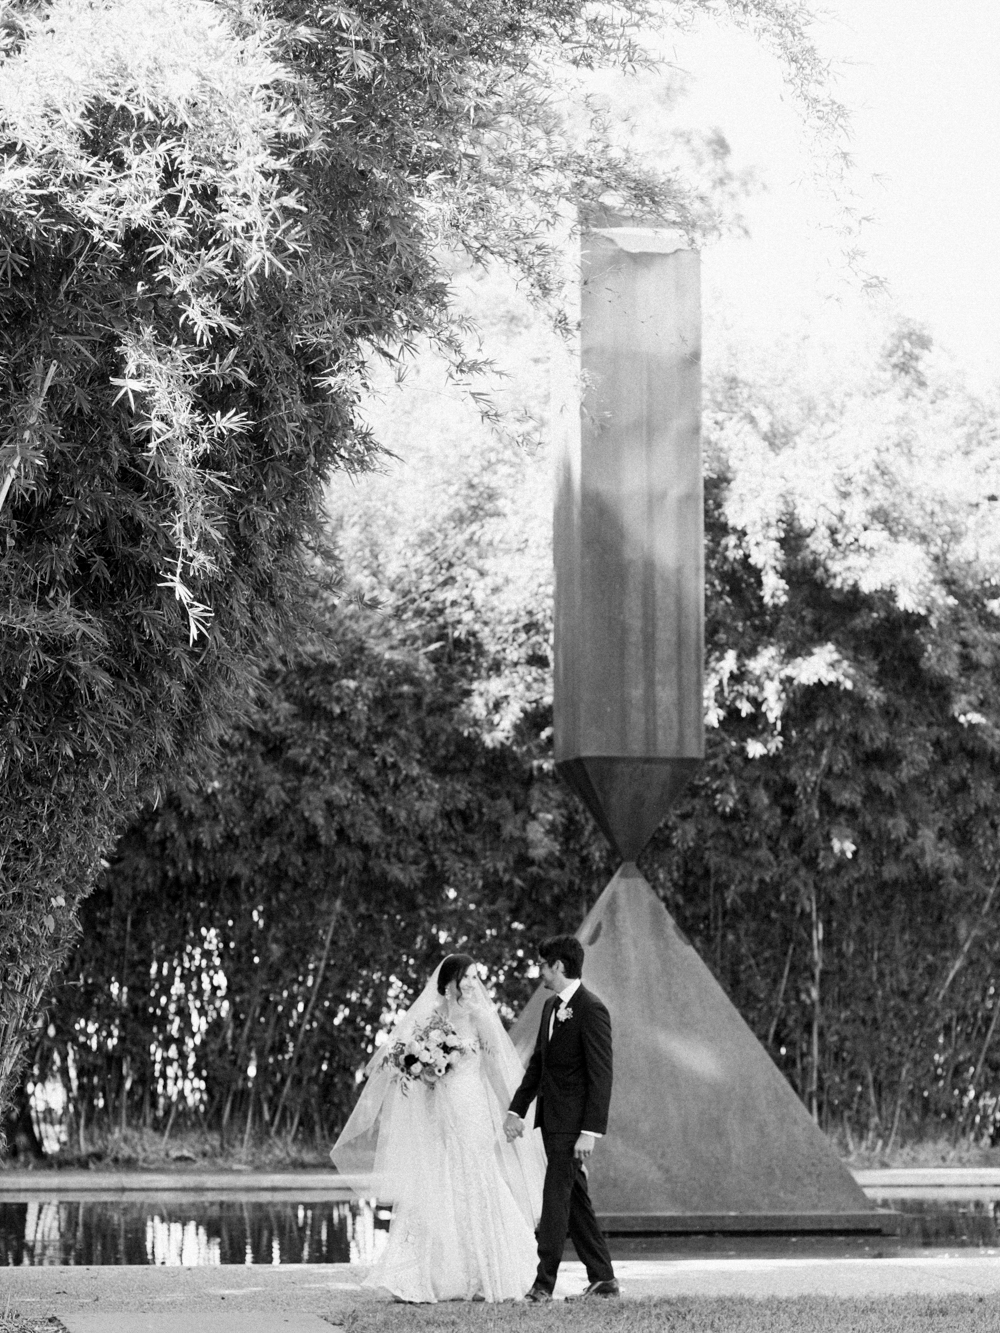 Christine Gosch - destination film photographer - houston wedding photographer - fine art film photographer - elopement photographer - destination wedding - understated wedding - simple beautiful wedding photography-62.jpg